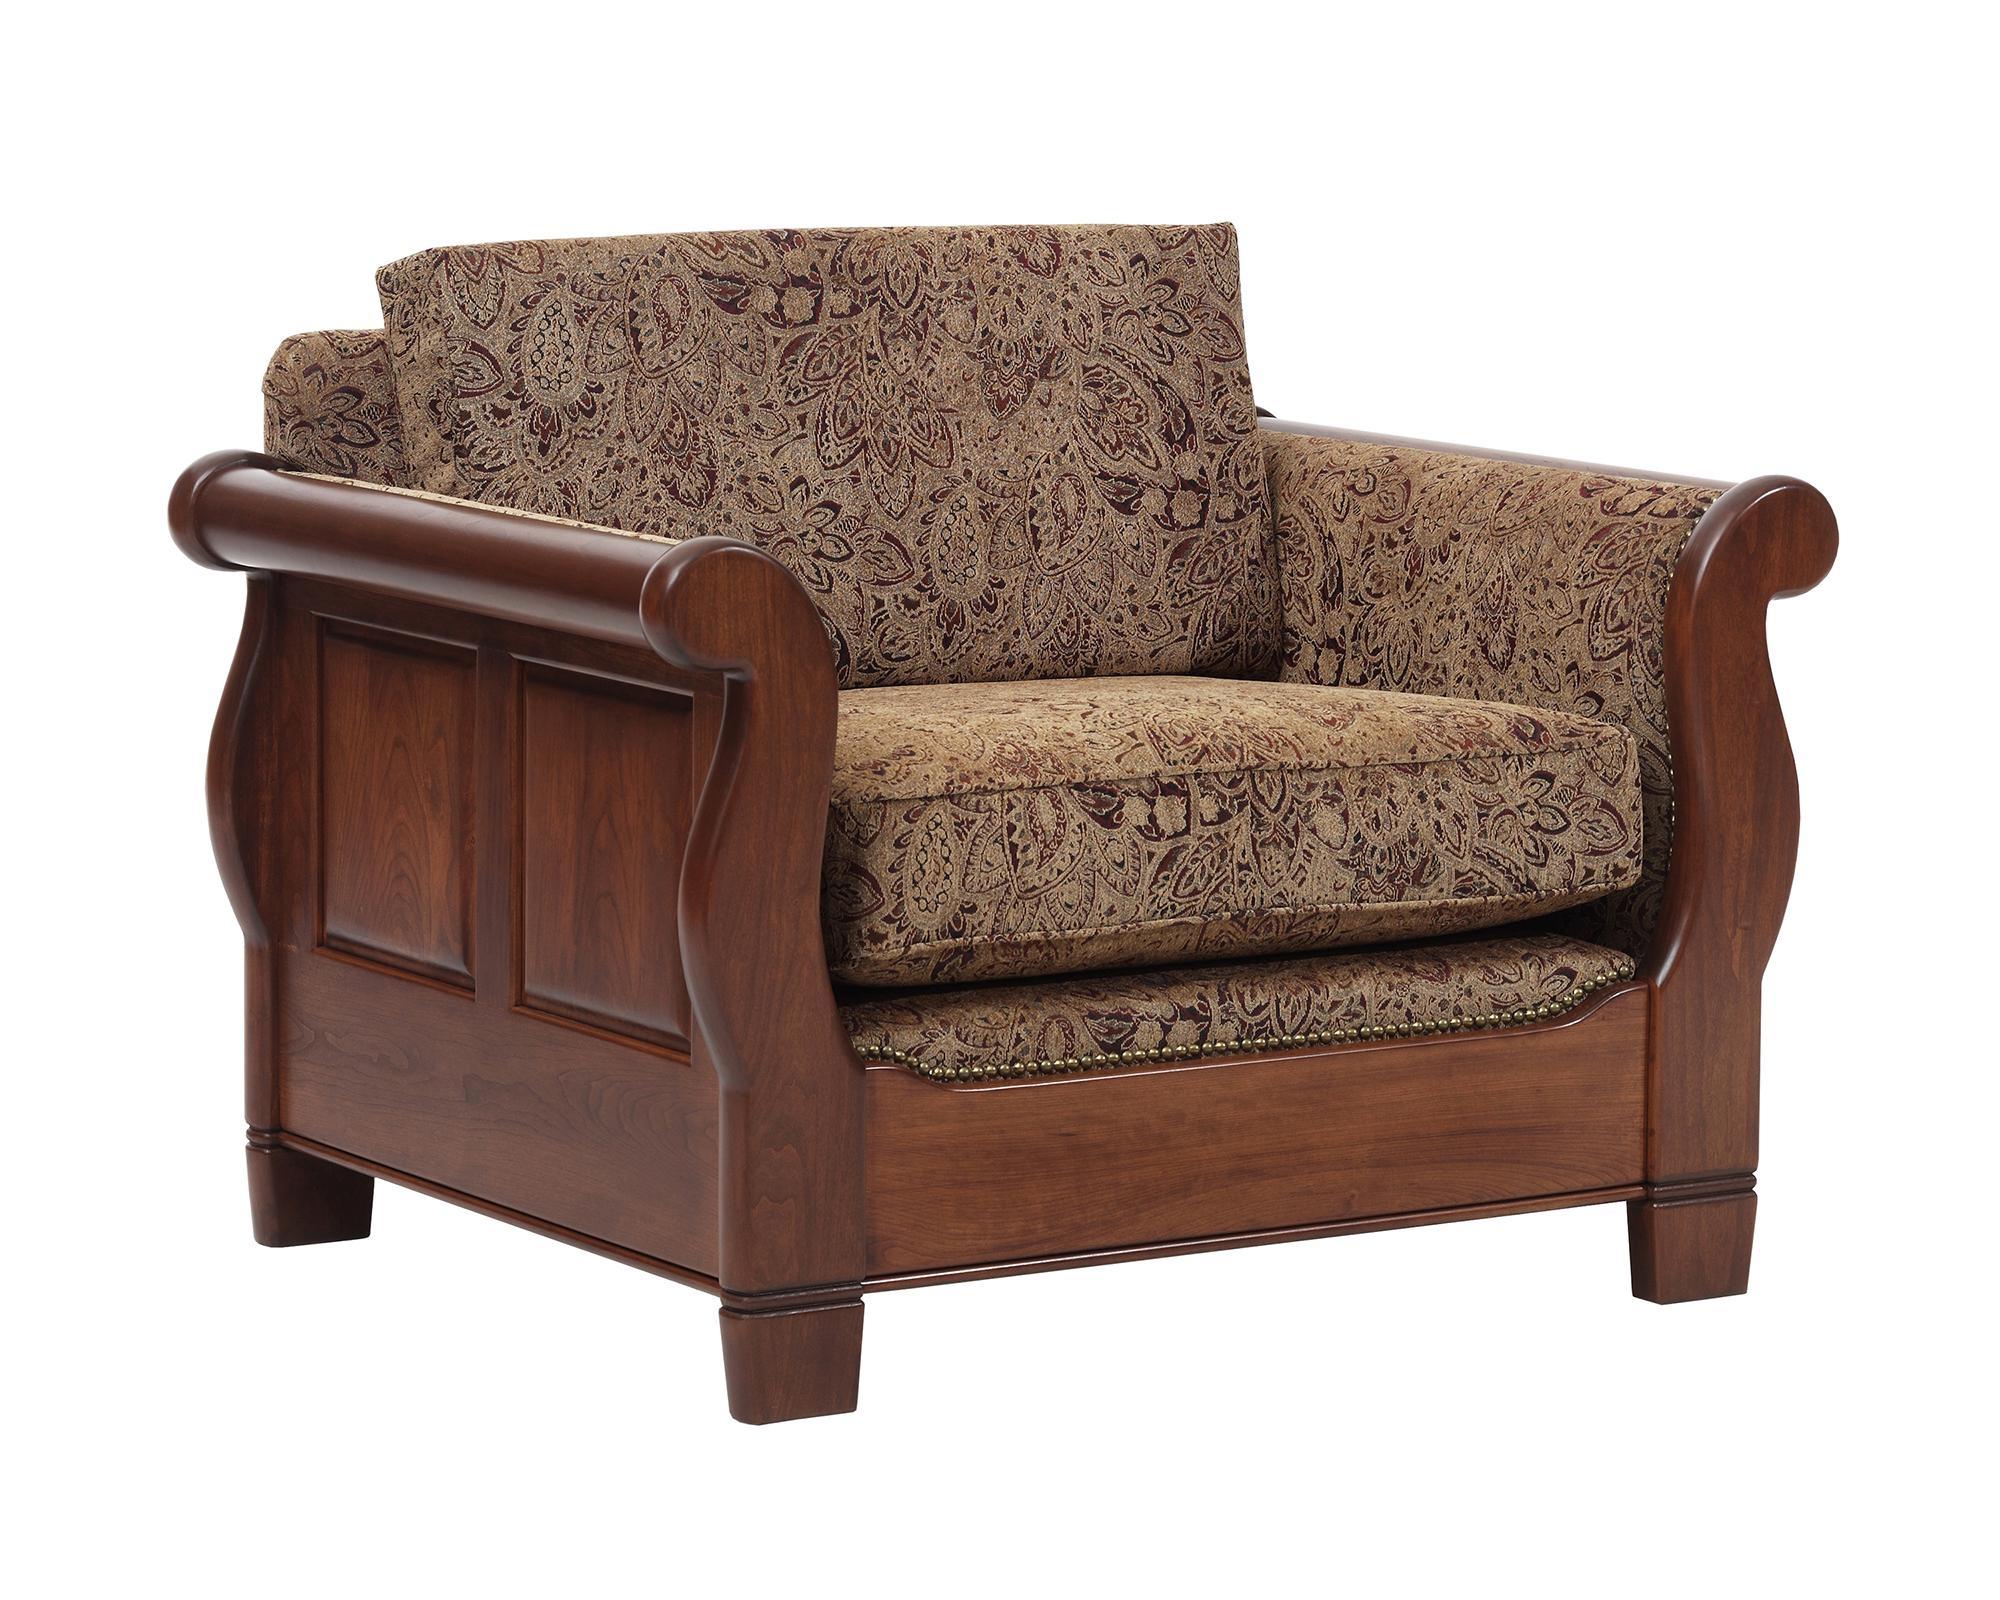 Sofa Chairs | Sofa Gallery | Kengire Inside Sofa Chairs (Image 17 of 20)